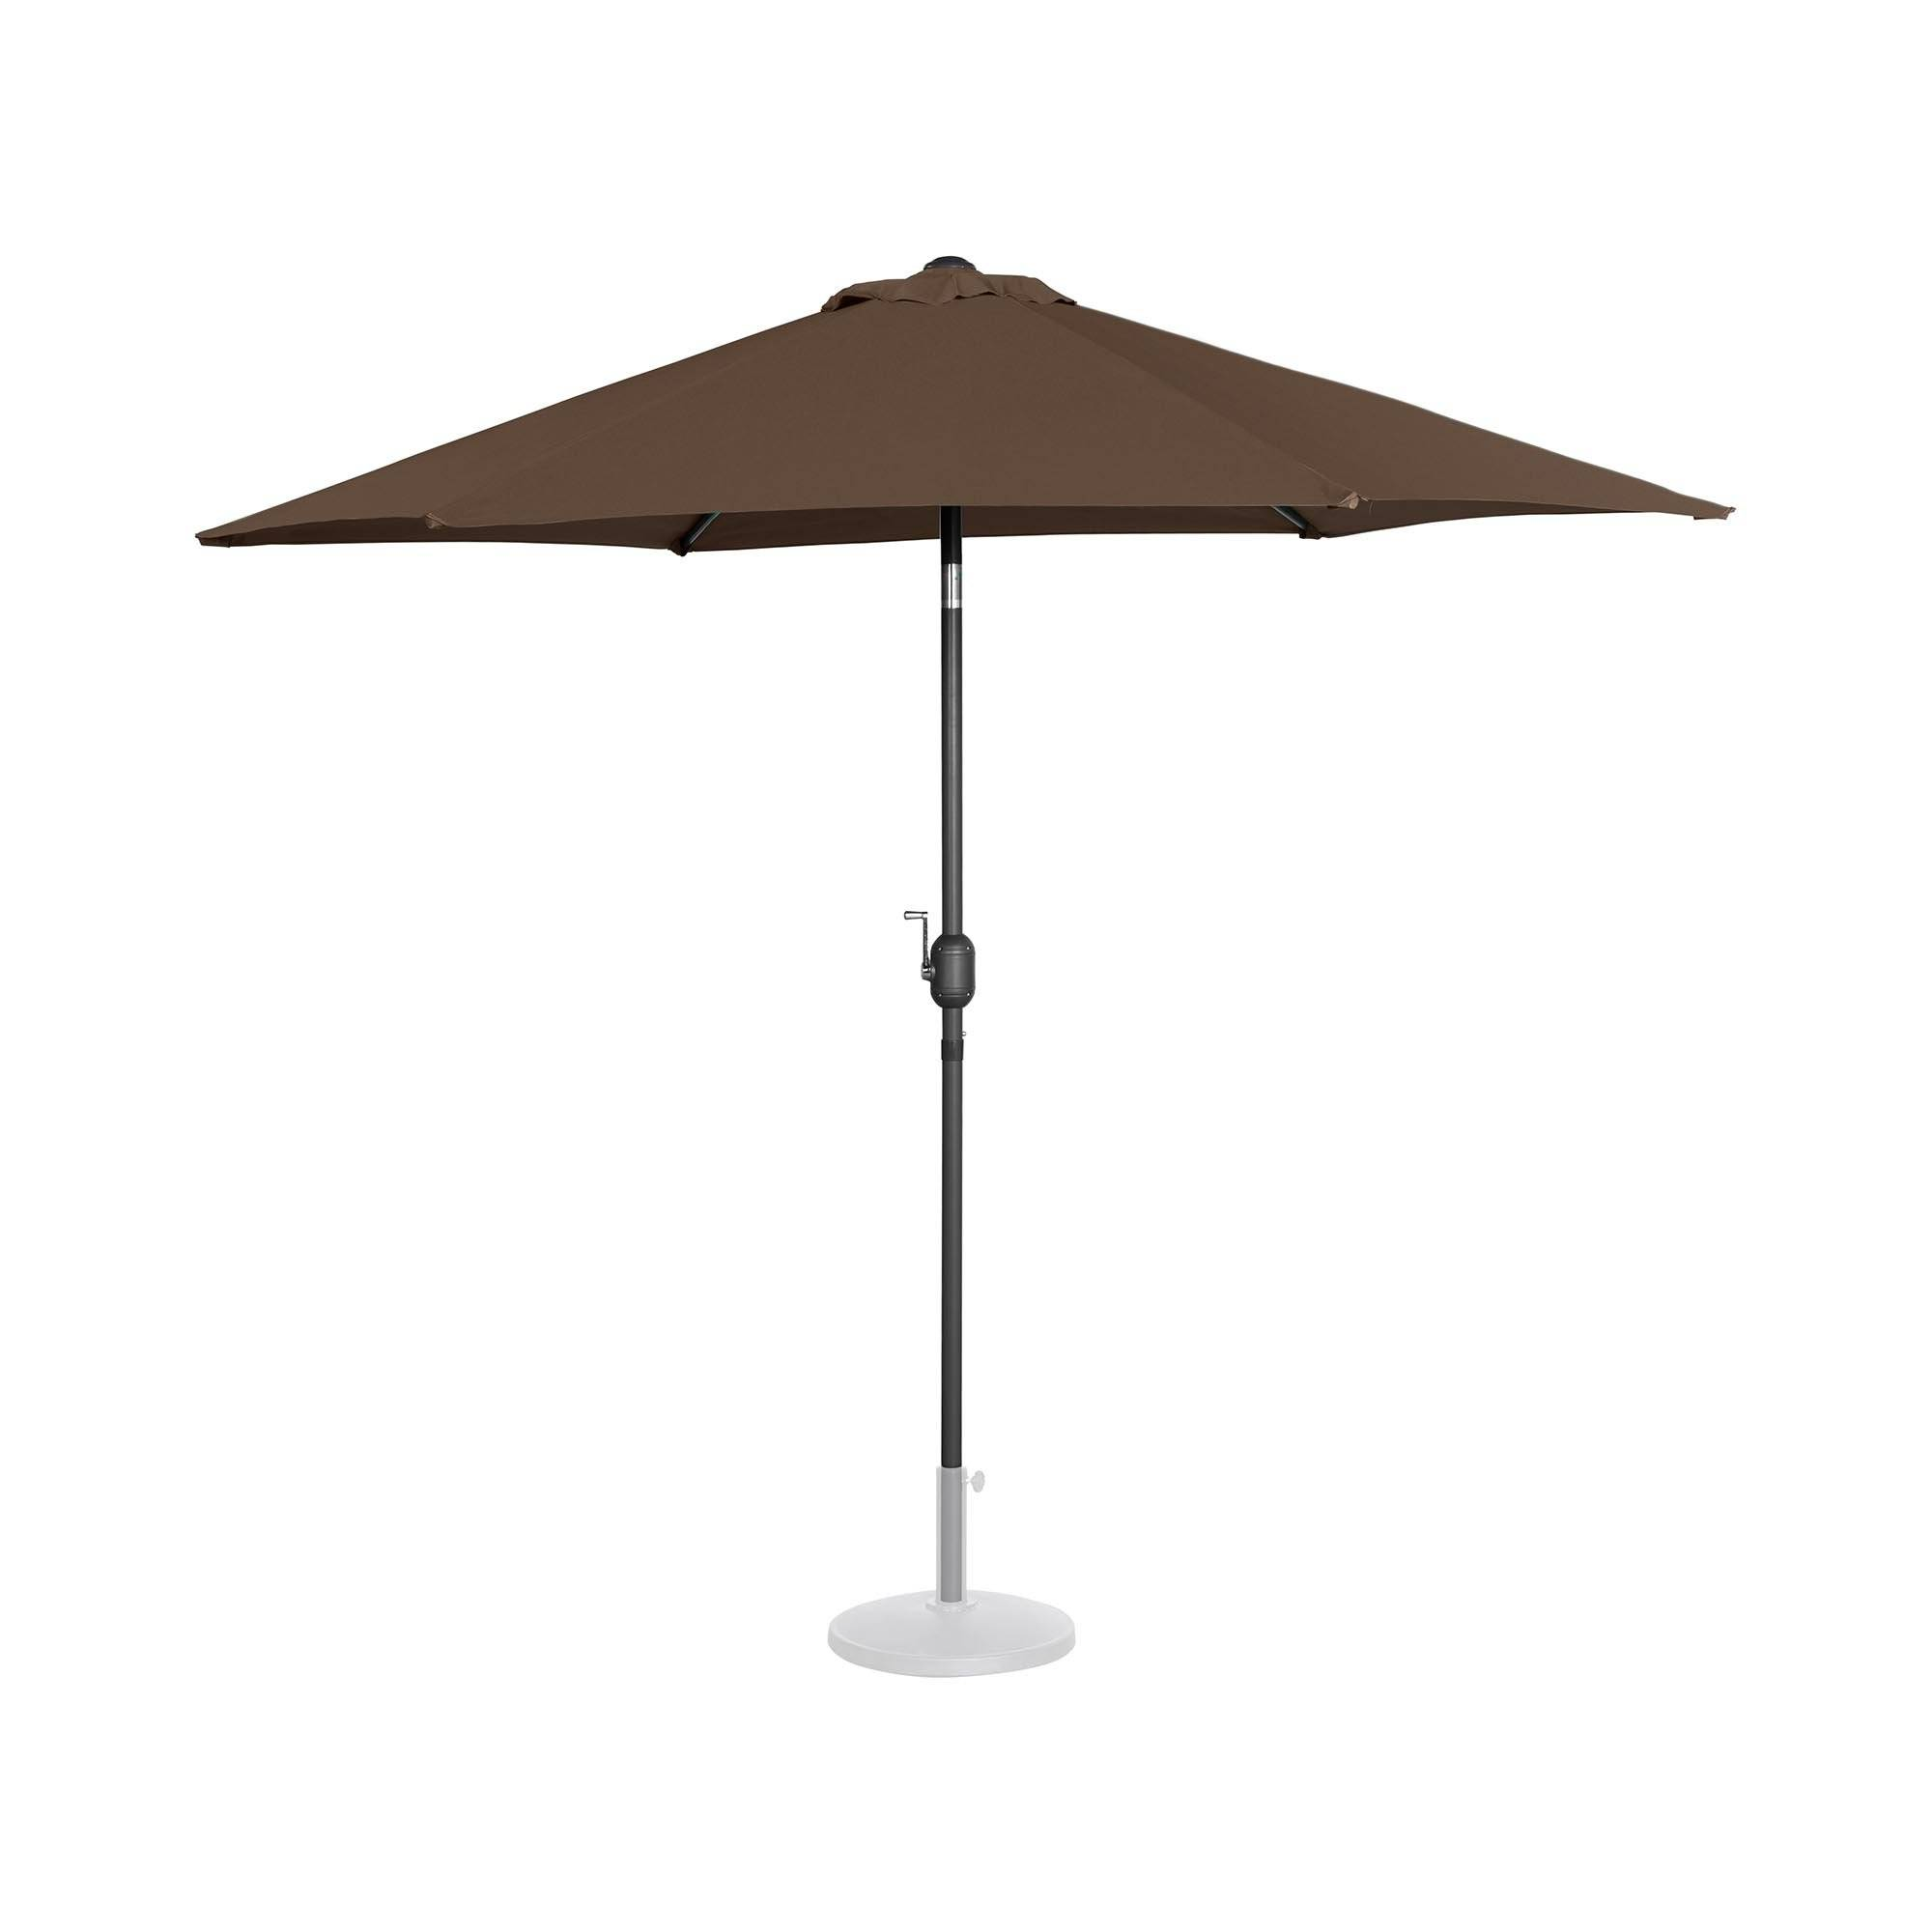 Uniprodo Parasol - brun - sekskantet - 270 cm i diameter - knæk-position UNI_UMBRELLA_R270BR